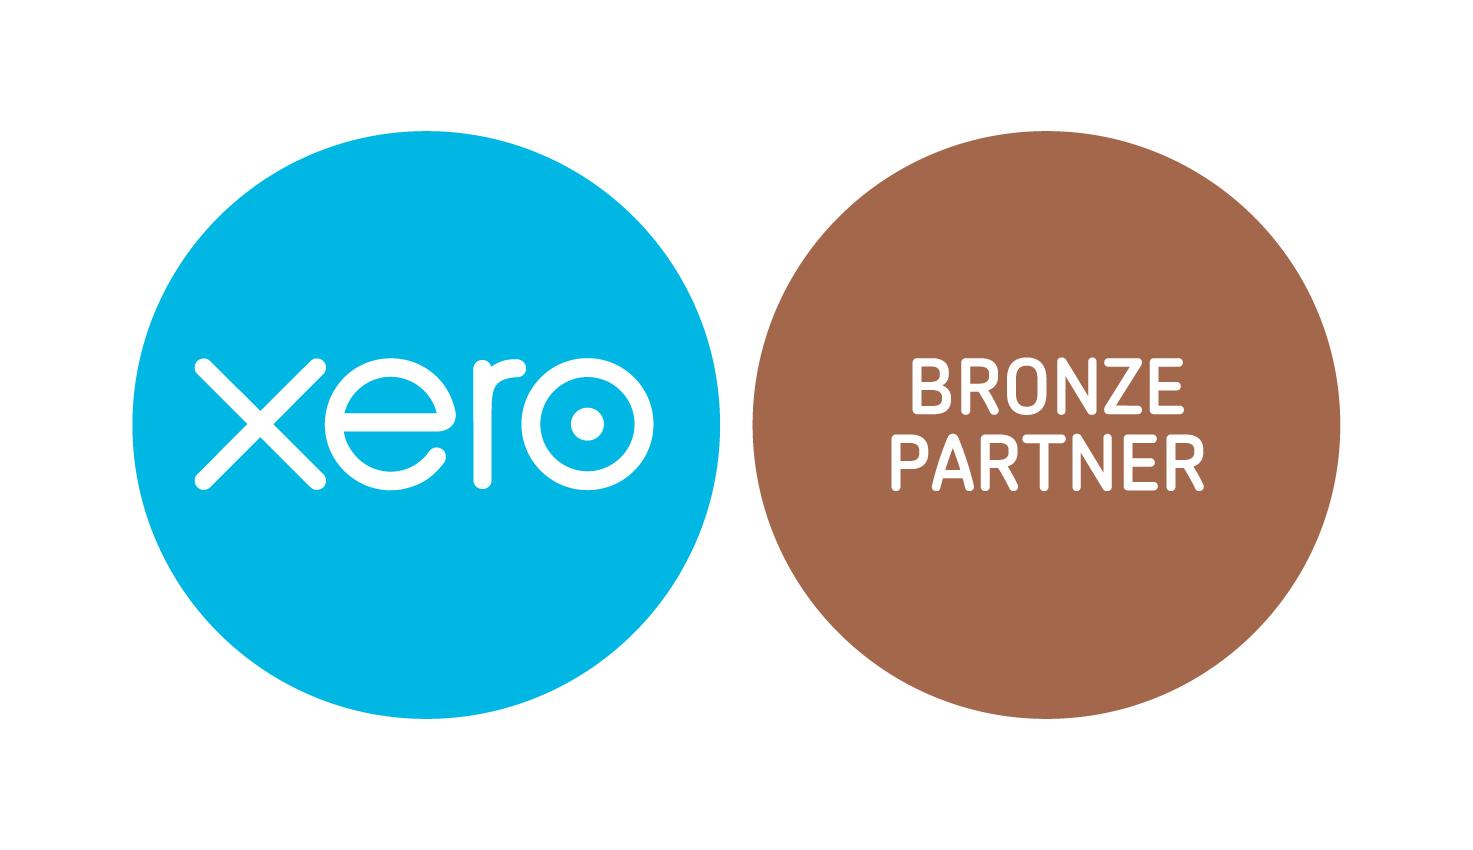 Xero Bronze Partner Logo Rgb